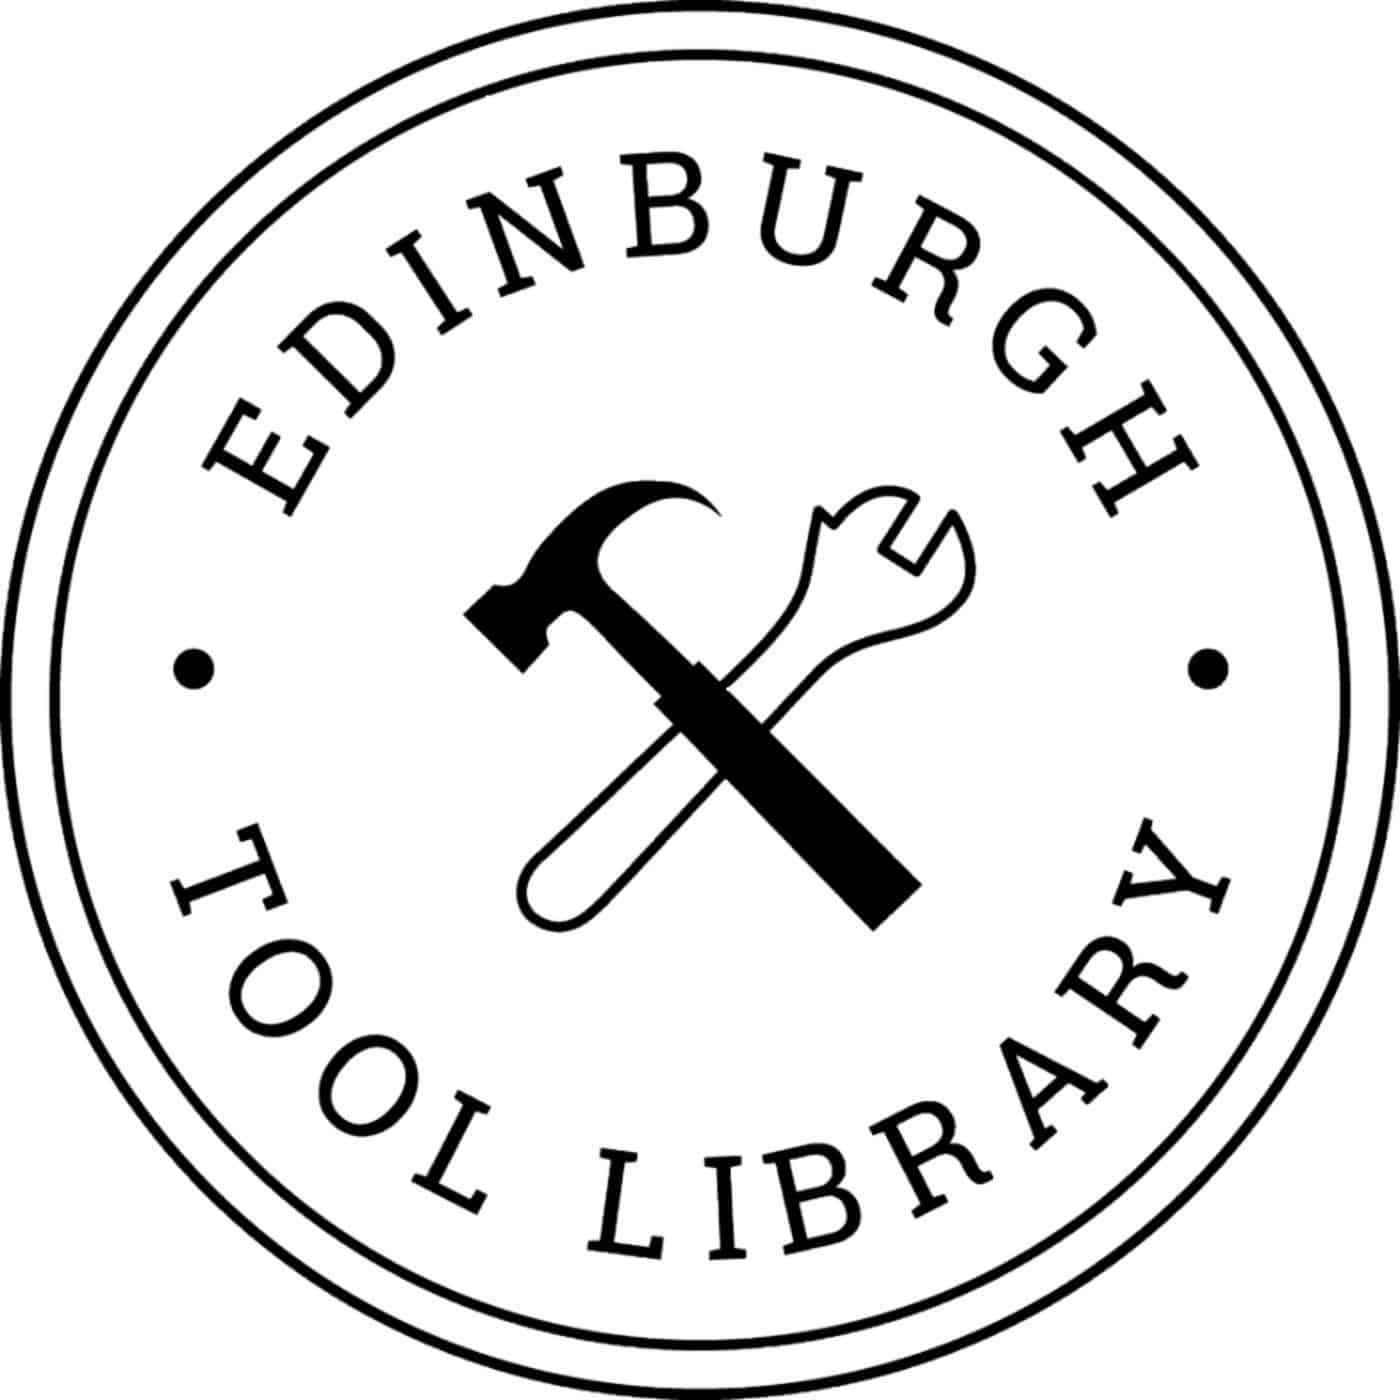 edinburgh-tool-library